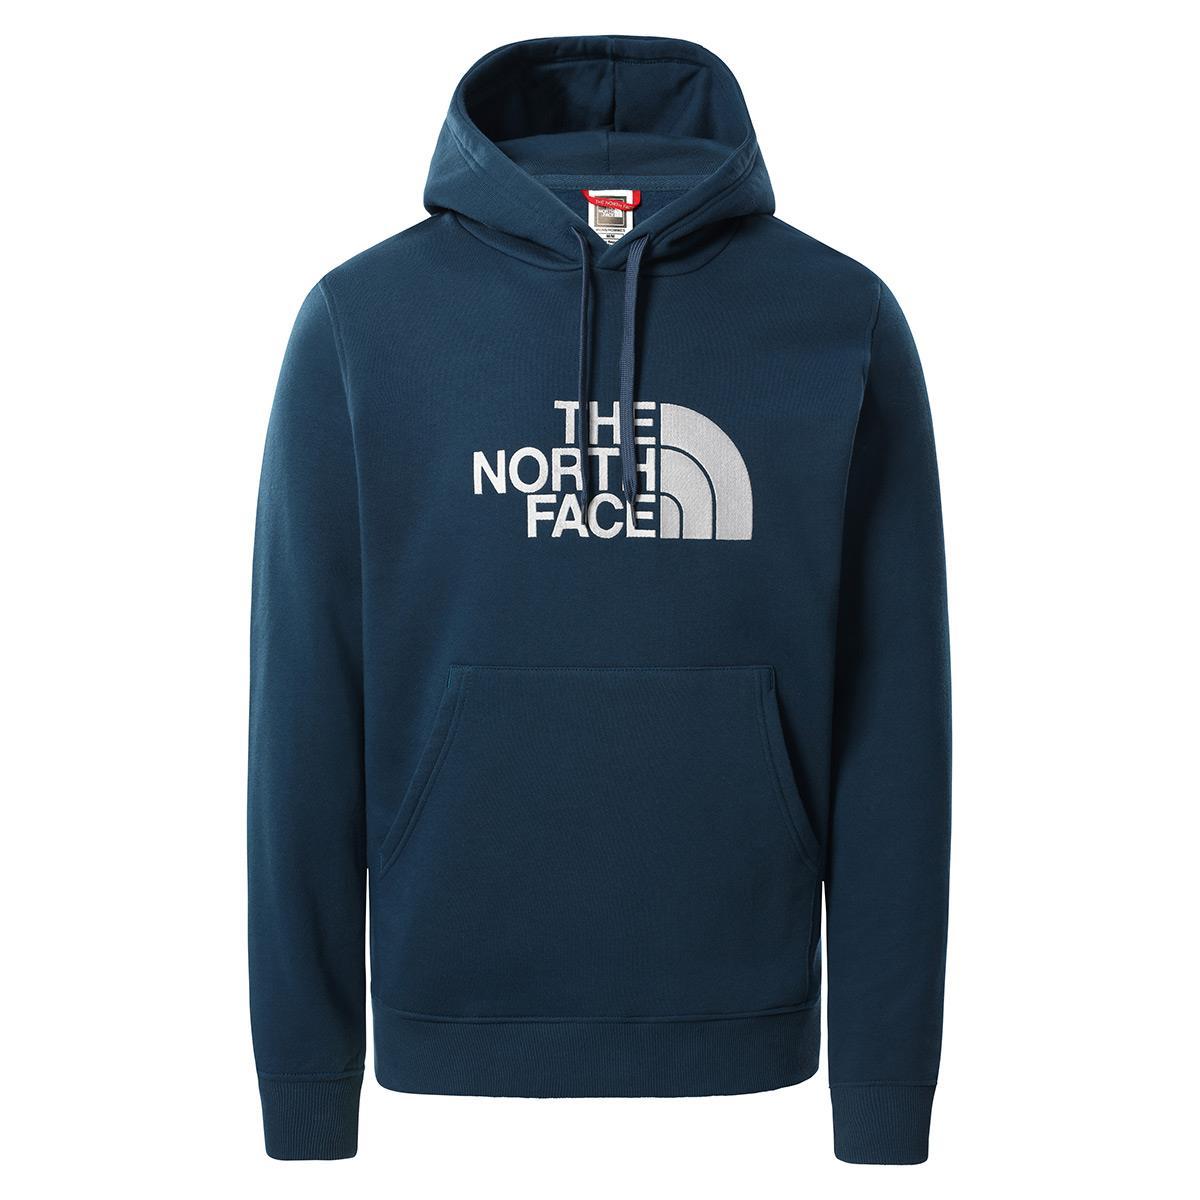 The North Face  Erkek DREKadın PEAK PULLOVER HOODIE   Sweat Shirt